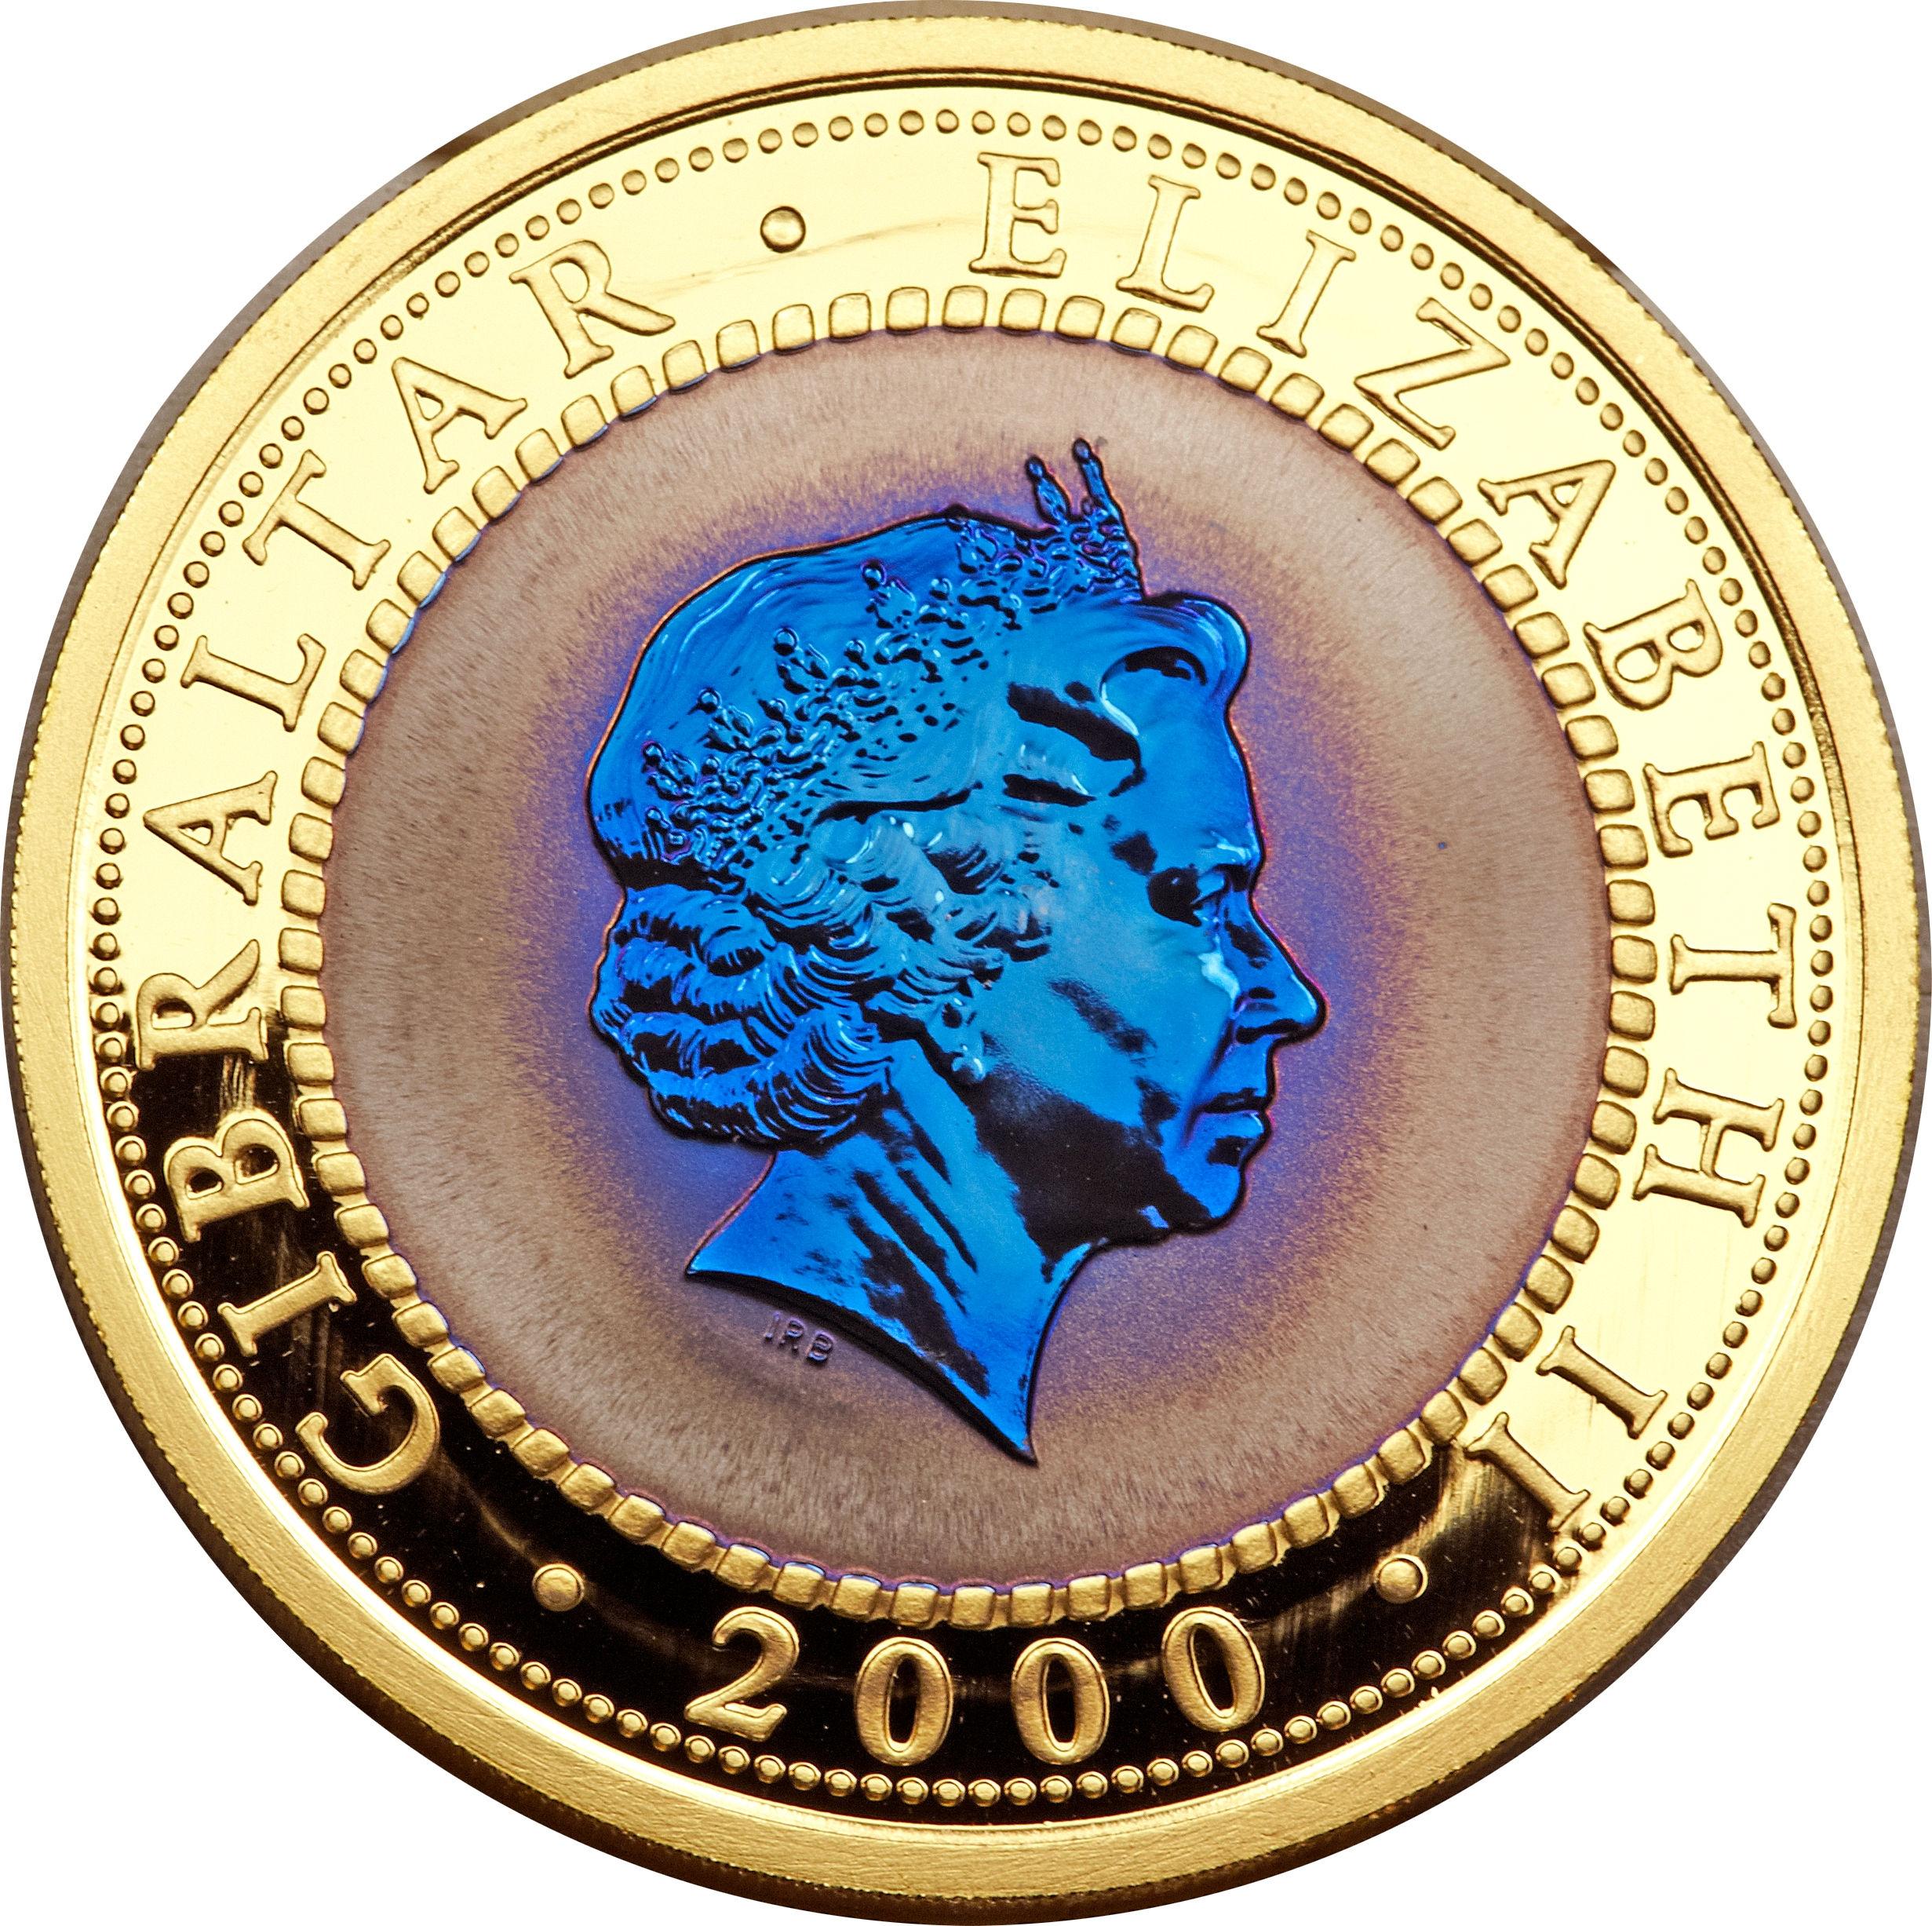 1 Crown - Elizabeth II - Uniform Penny Post - 4'th Portrait